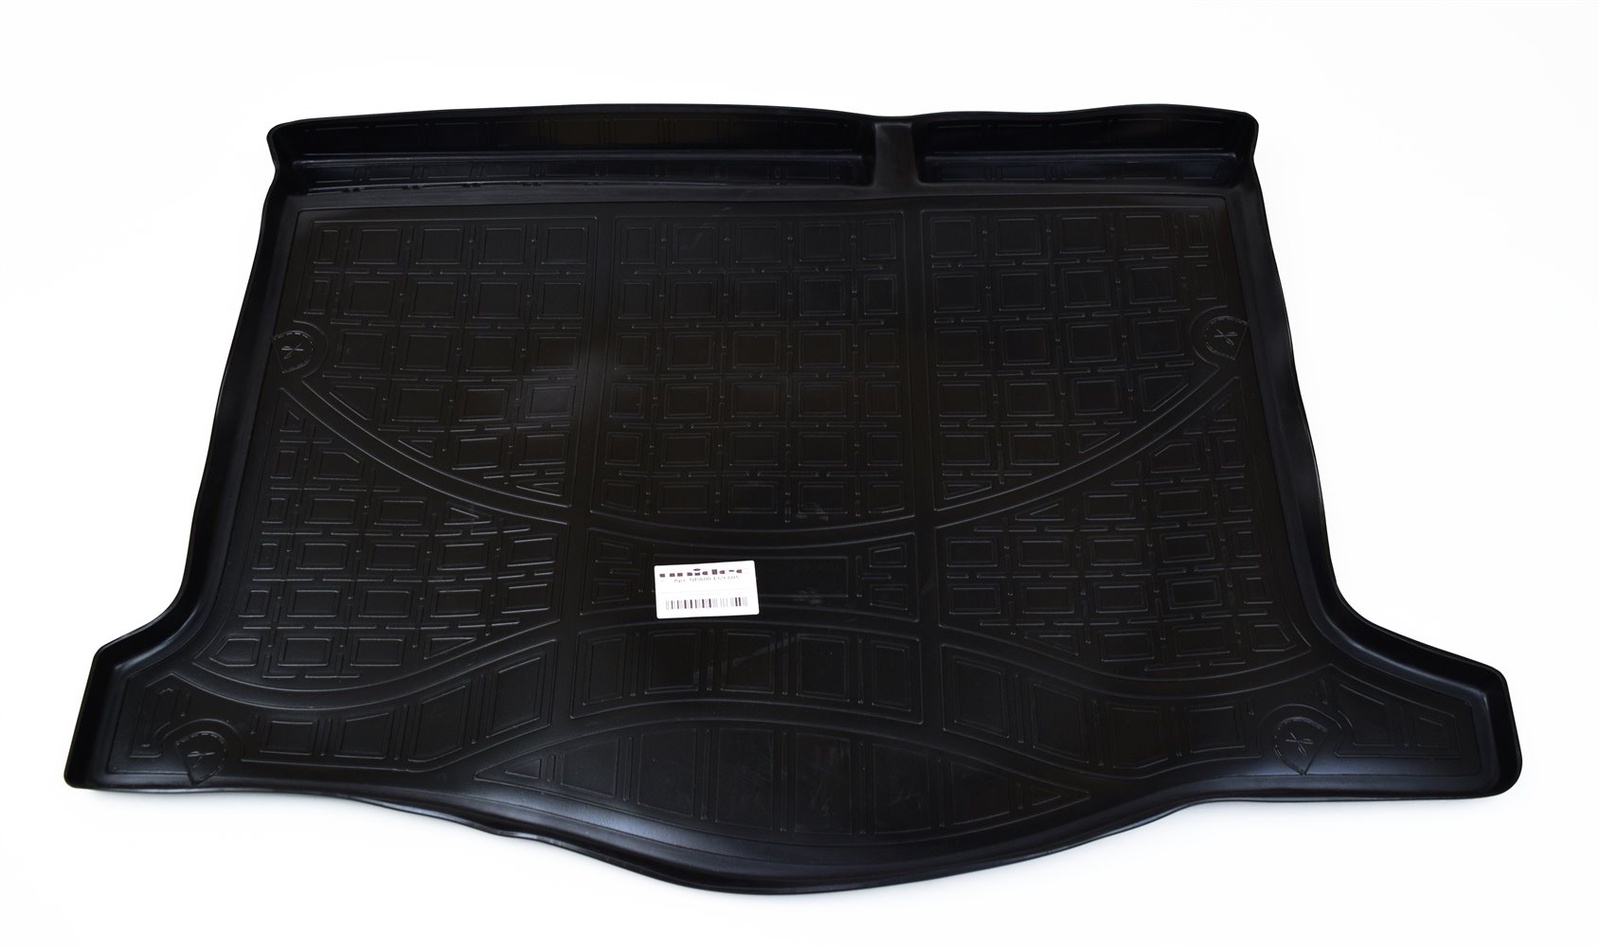 Коврик багажника Norplast для Kia cee'd/Kia pro cee'd jd hb 2012, npa00-e43-050, черный цена и фото